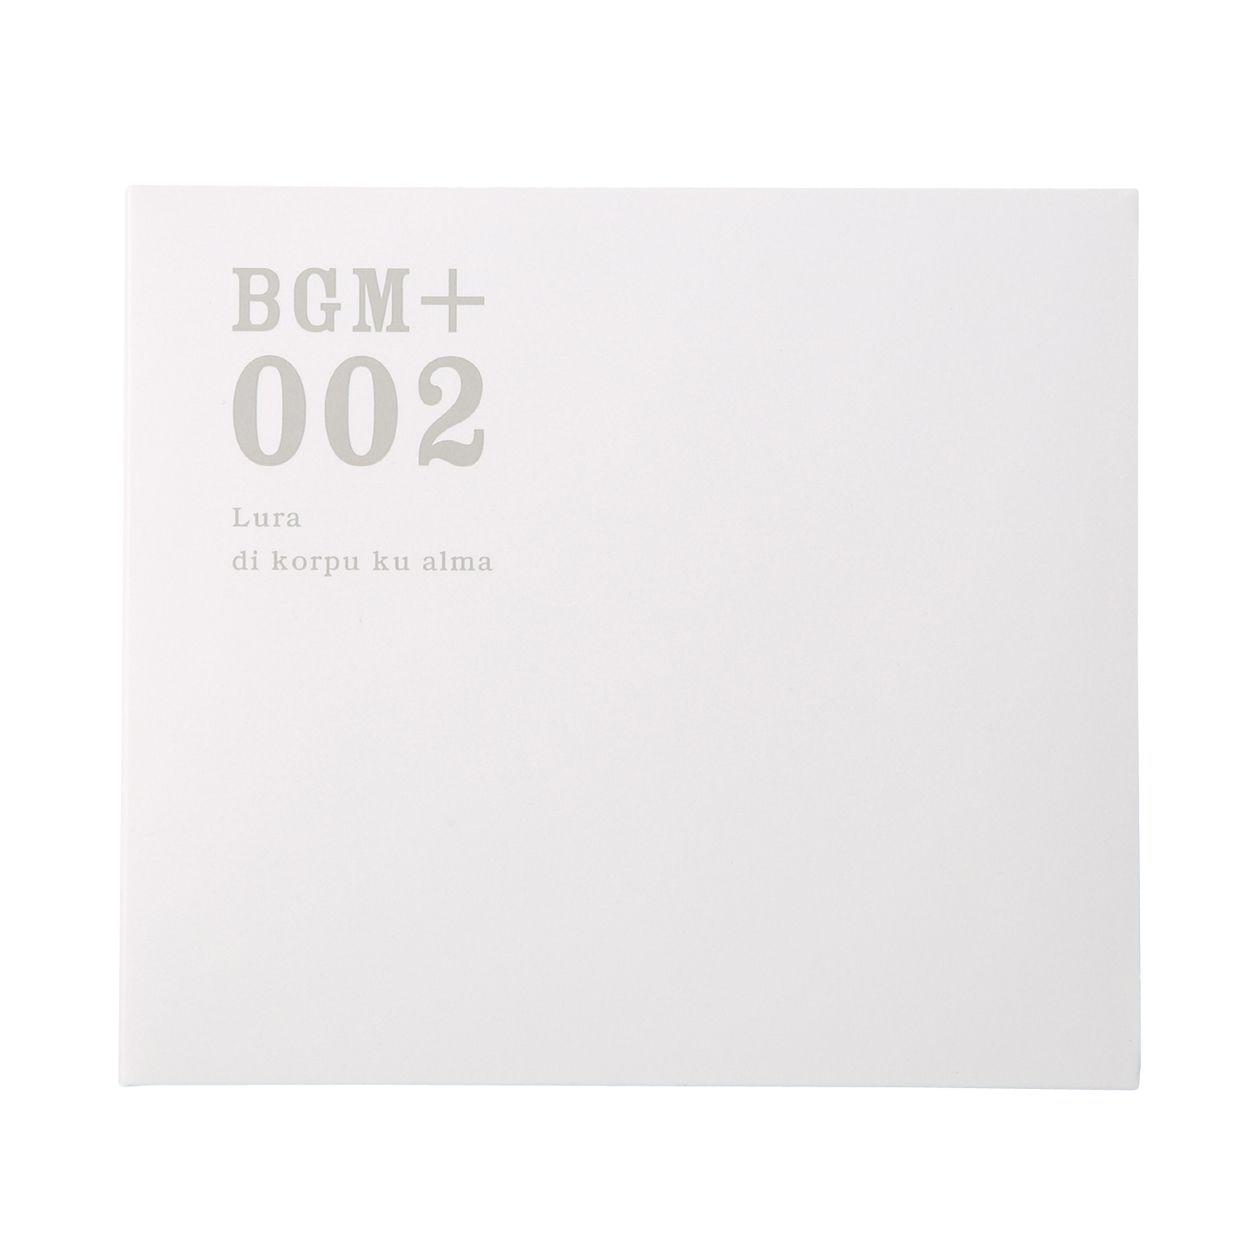 BGM+002